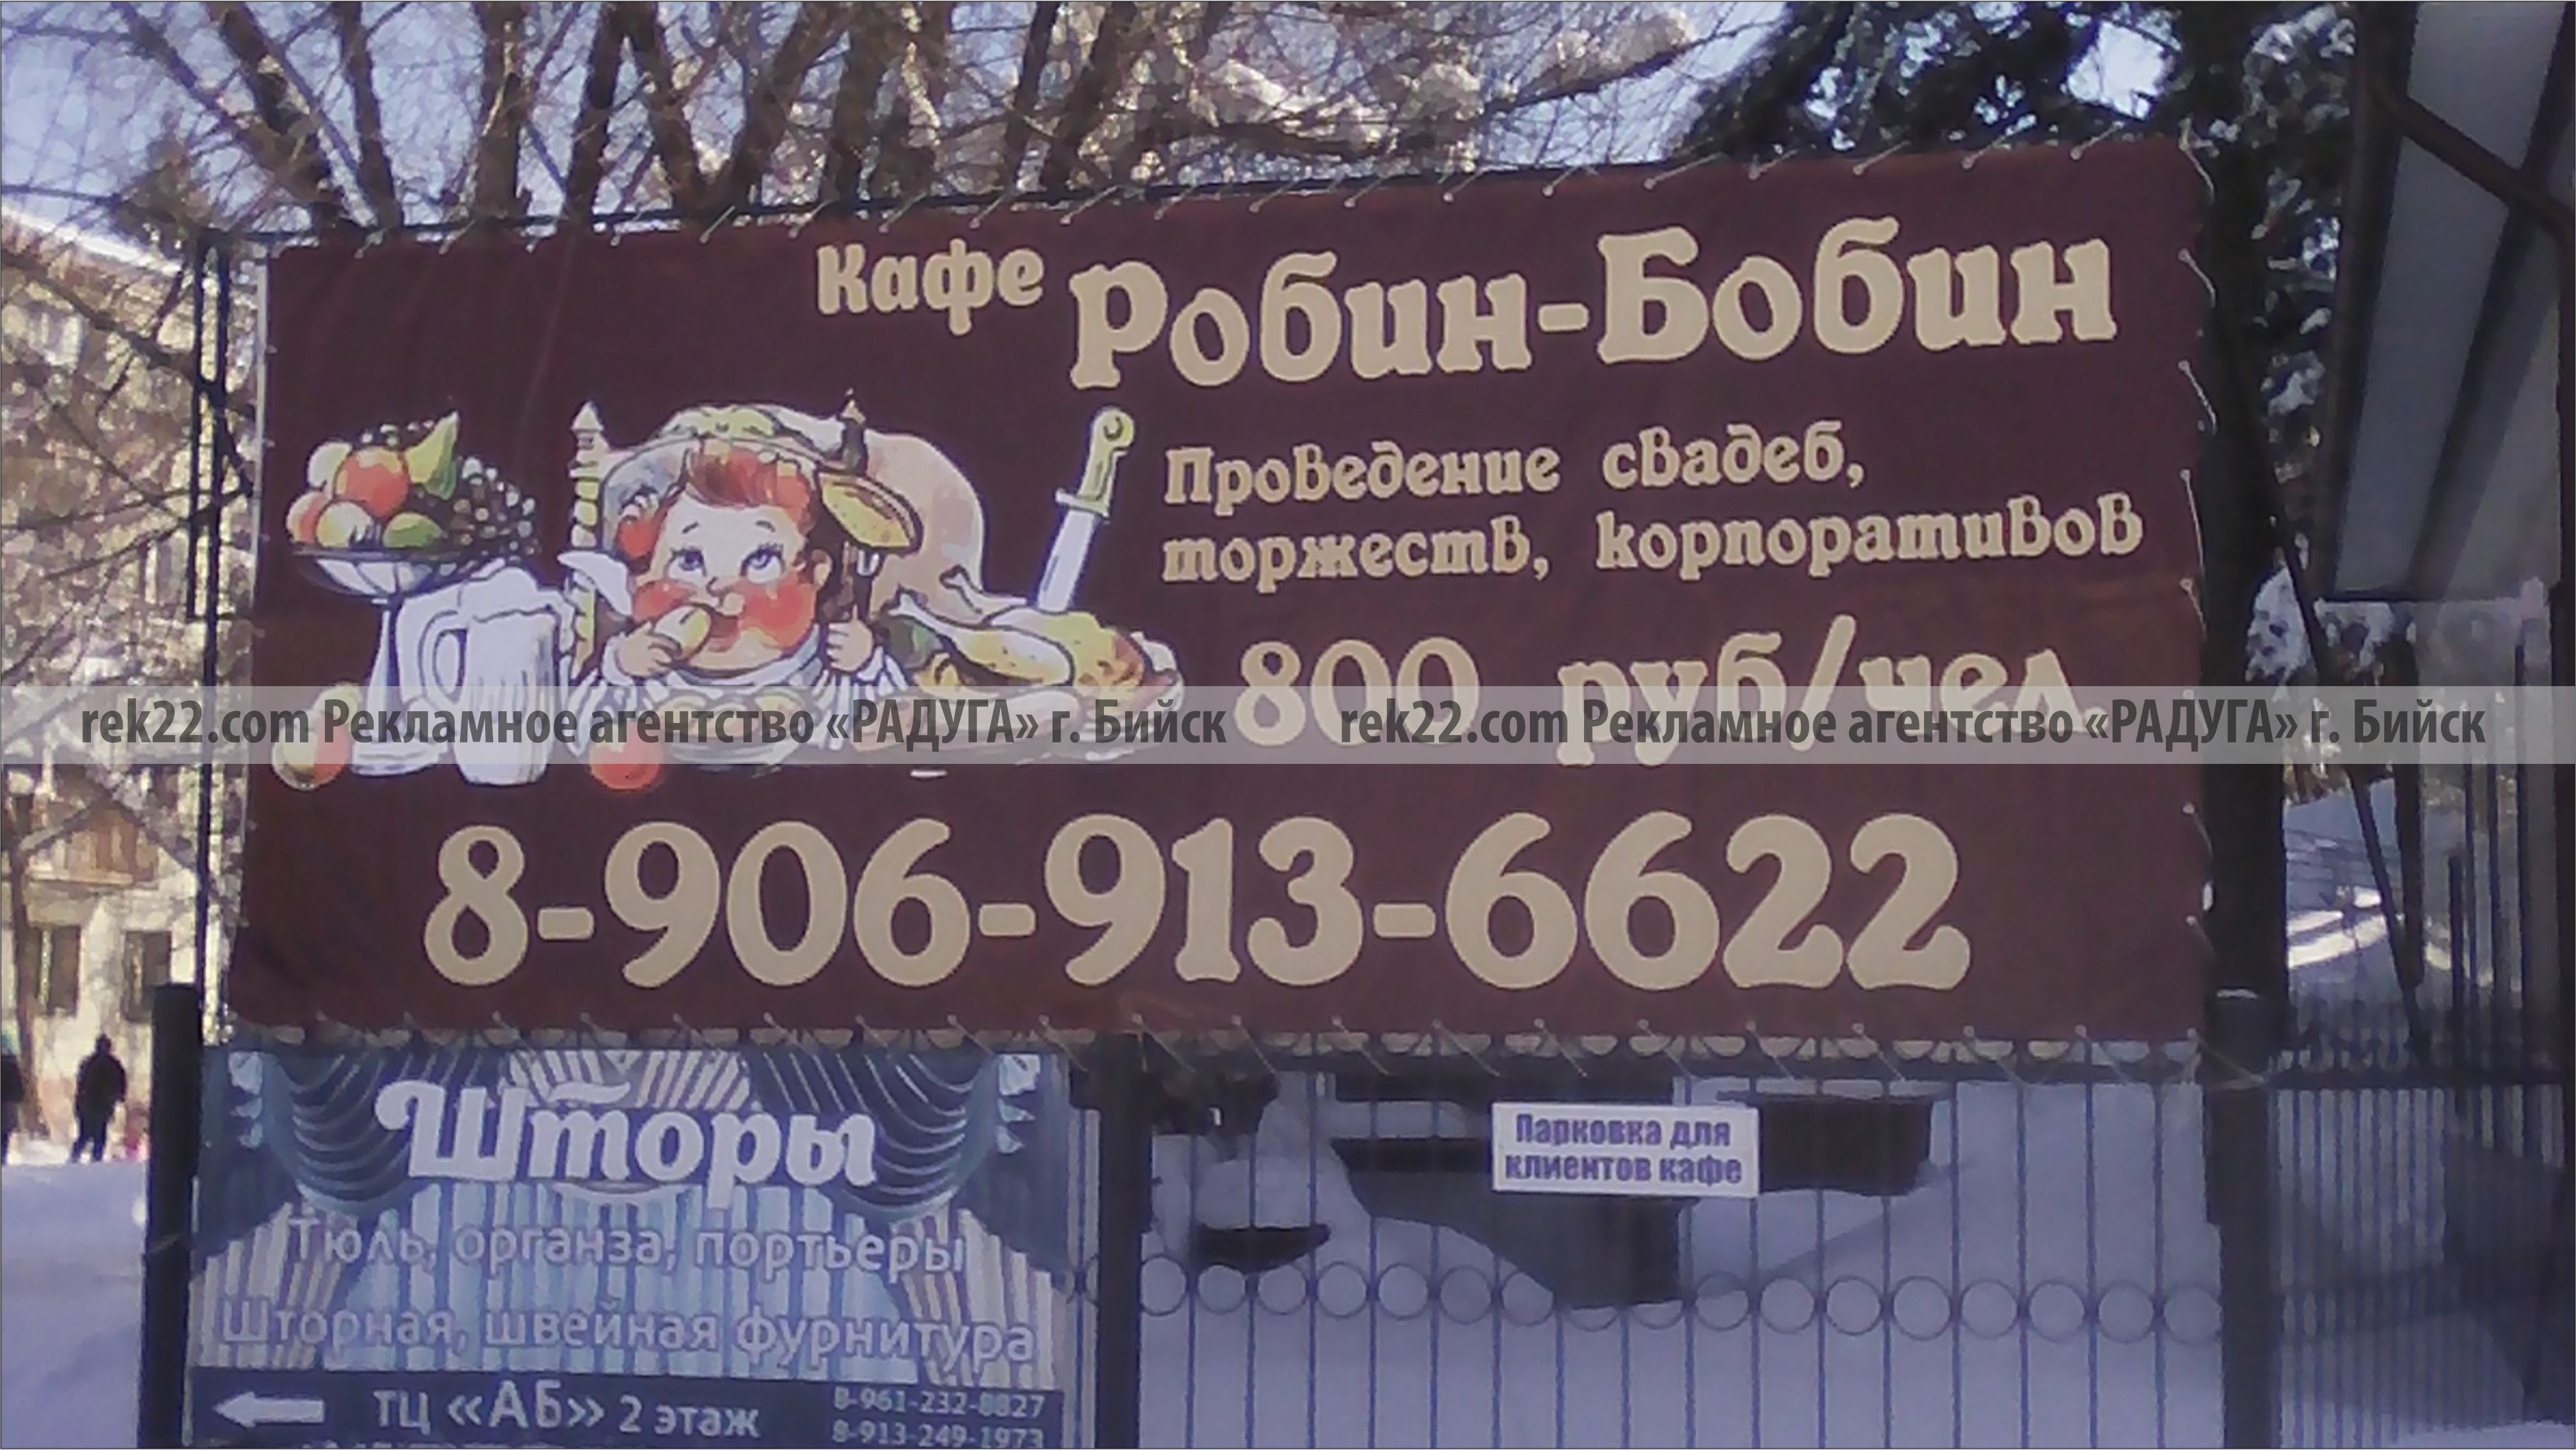 Реклама на транспорте Бийск - вывески, баннера, ПВХ - 1